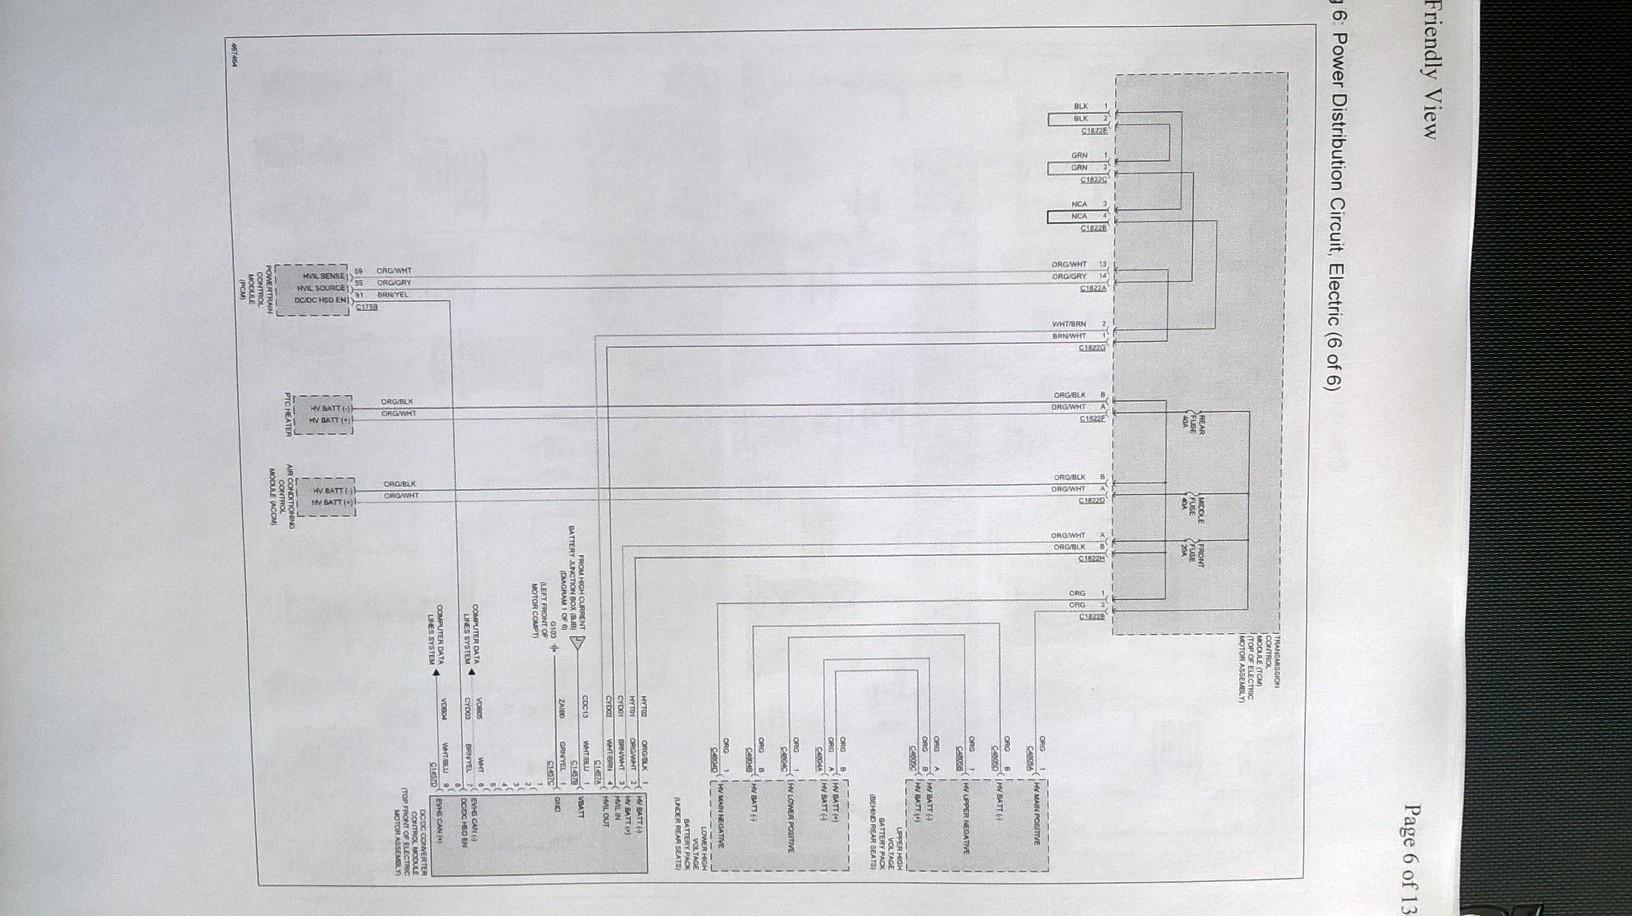 chicago 3 way wiring diagram  | 1021 x 747